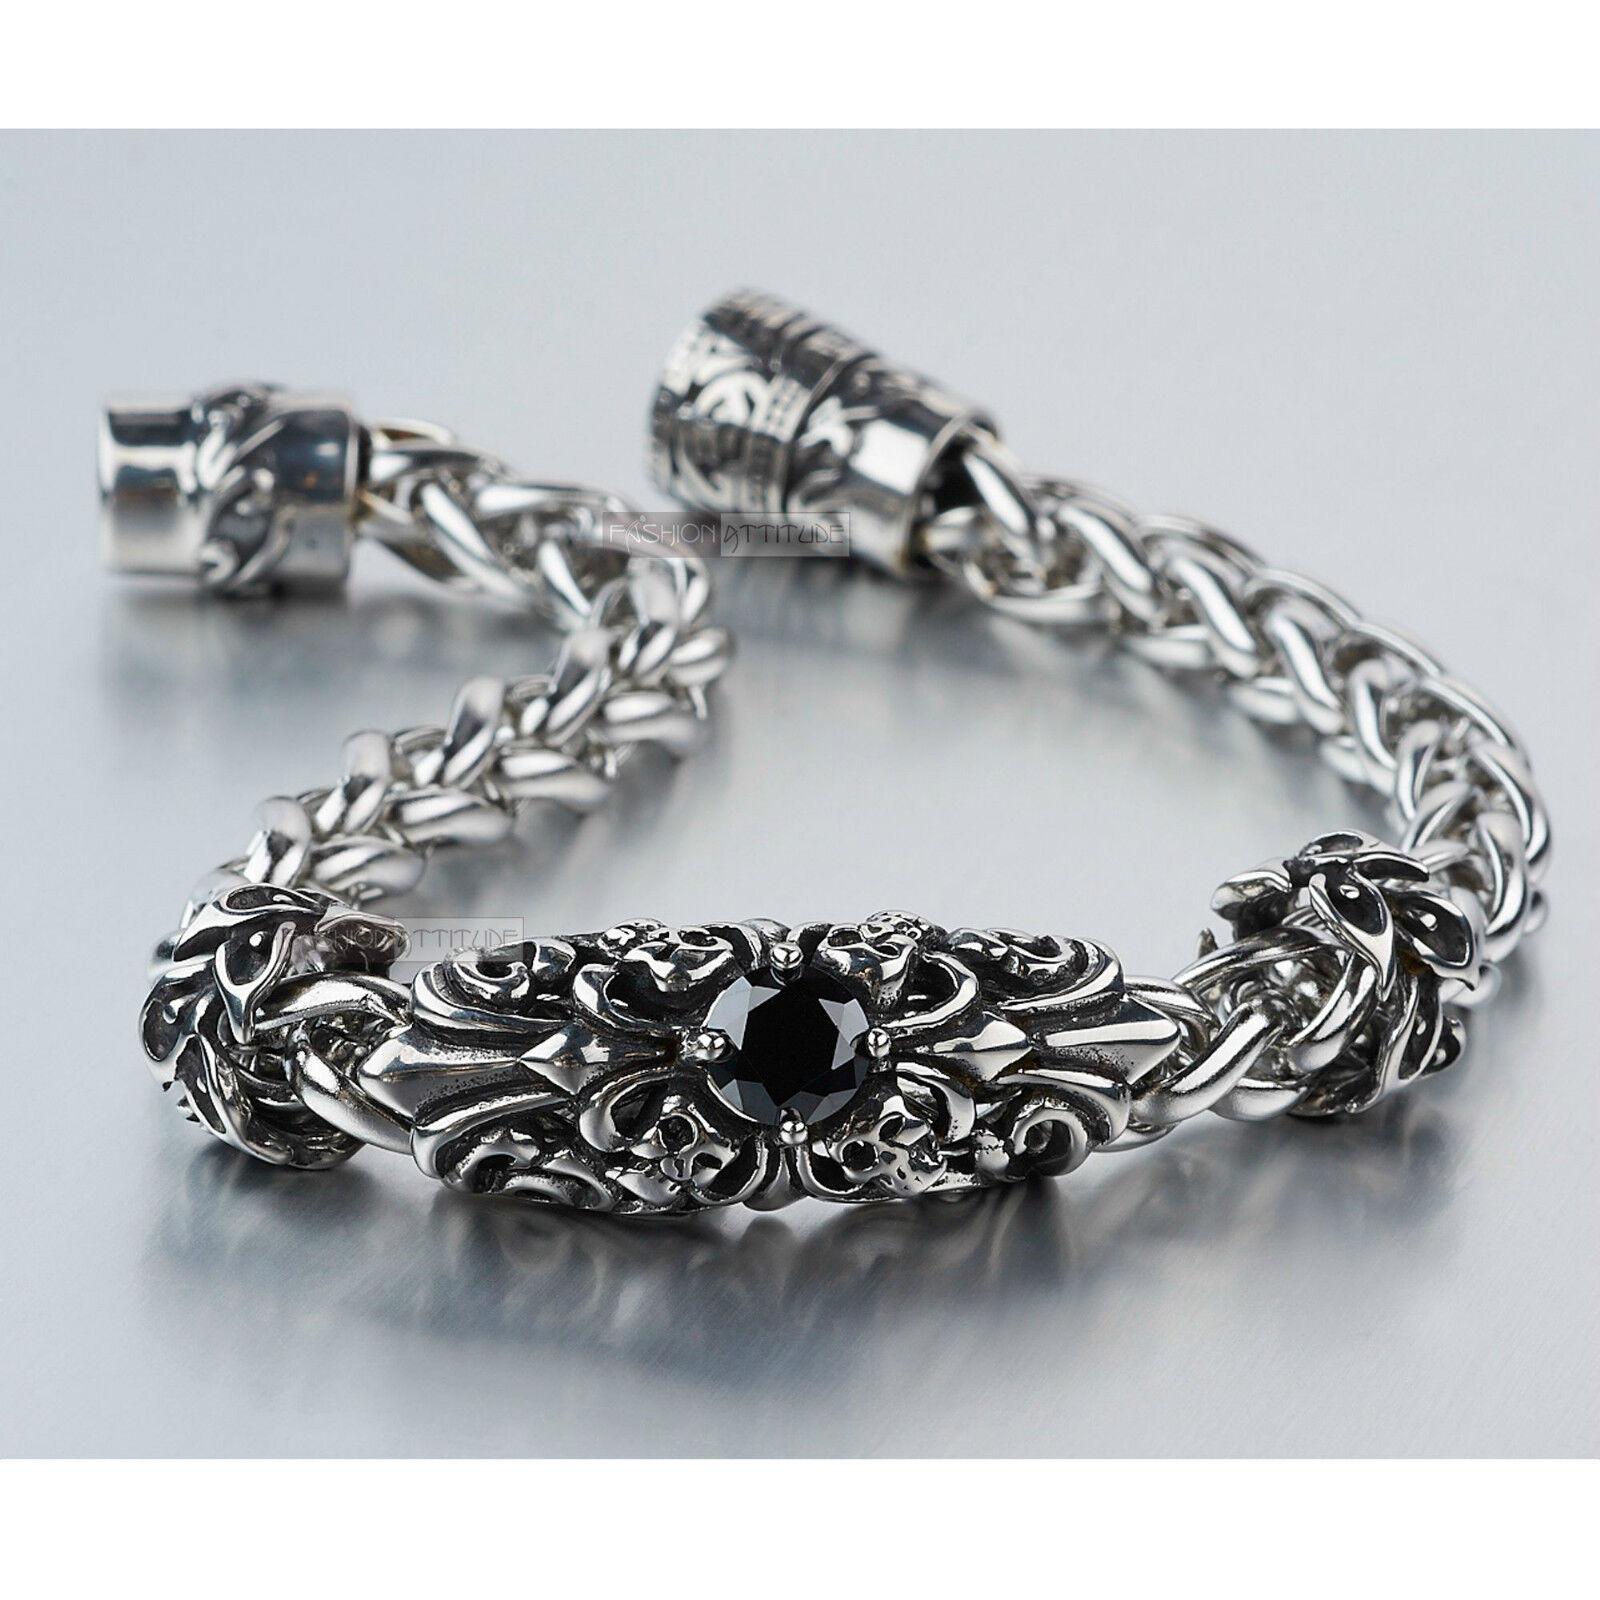 Silver bikies chain stainless steel made with swarovski crystal ... 42b4977493